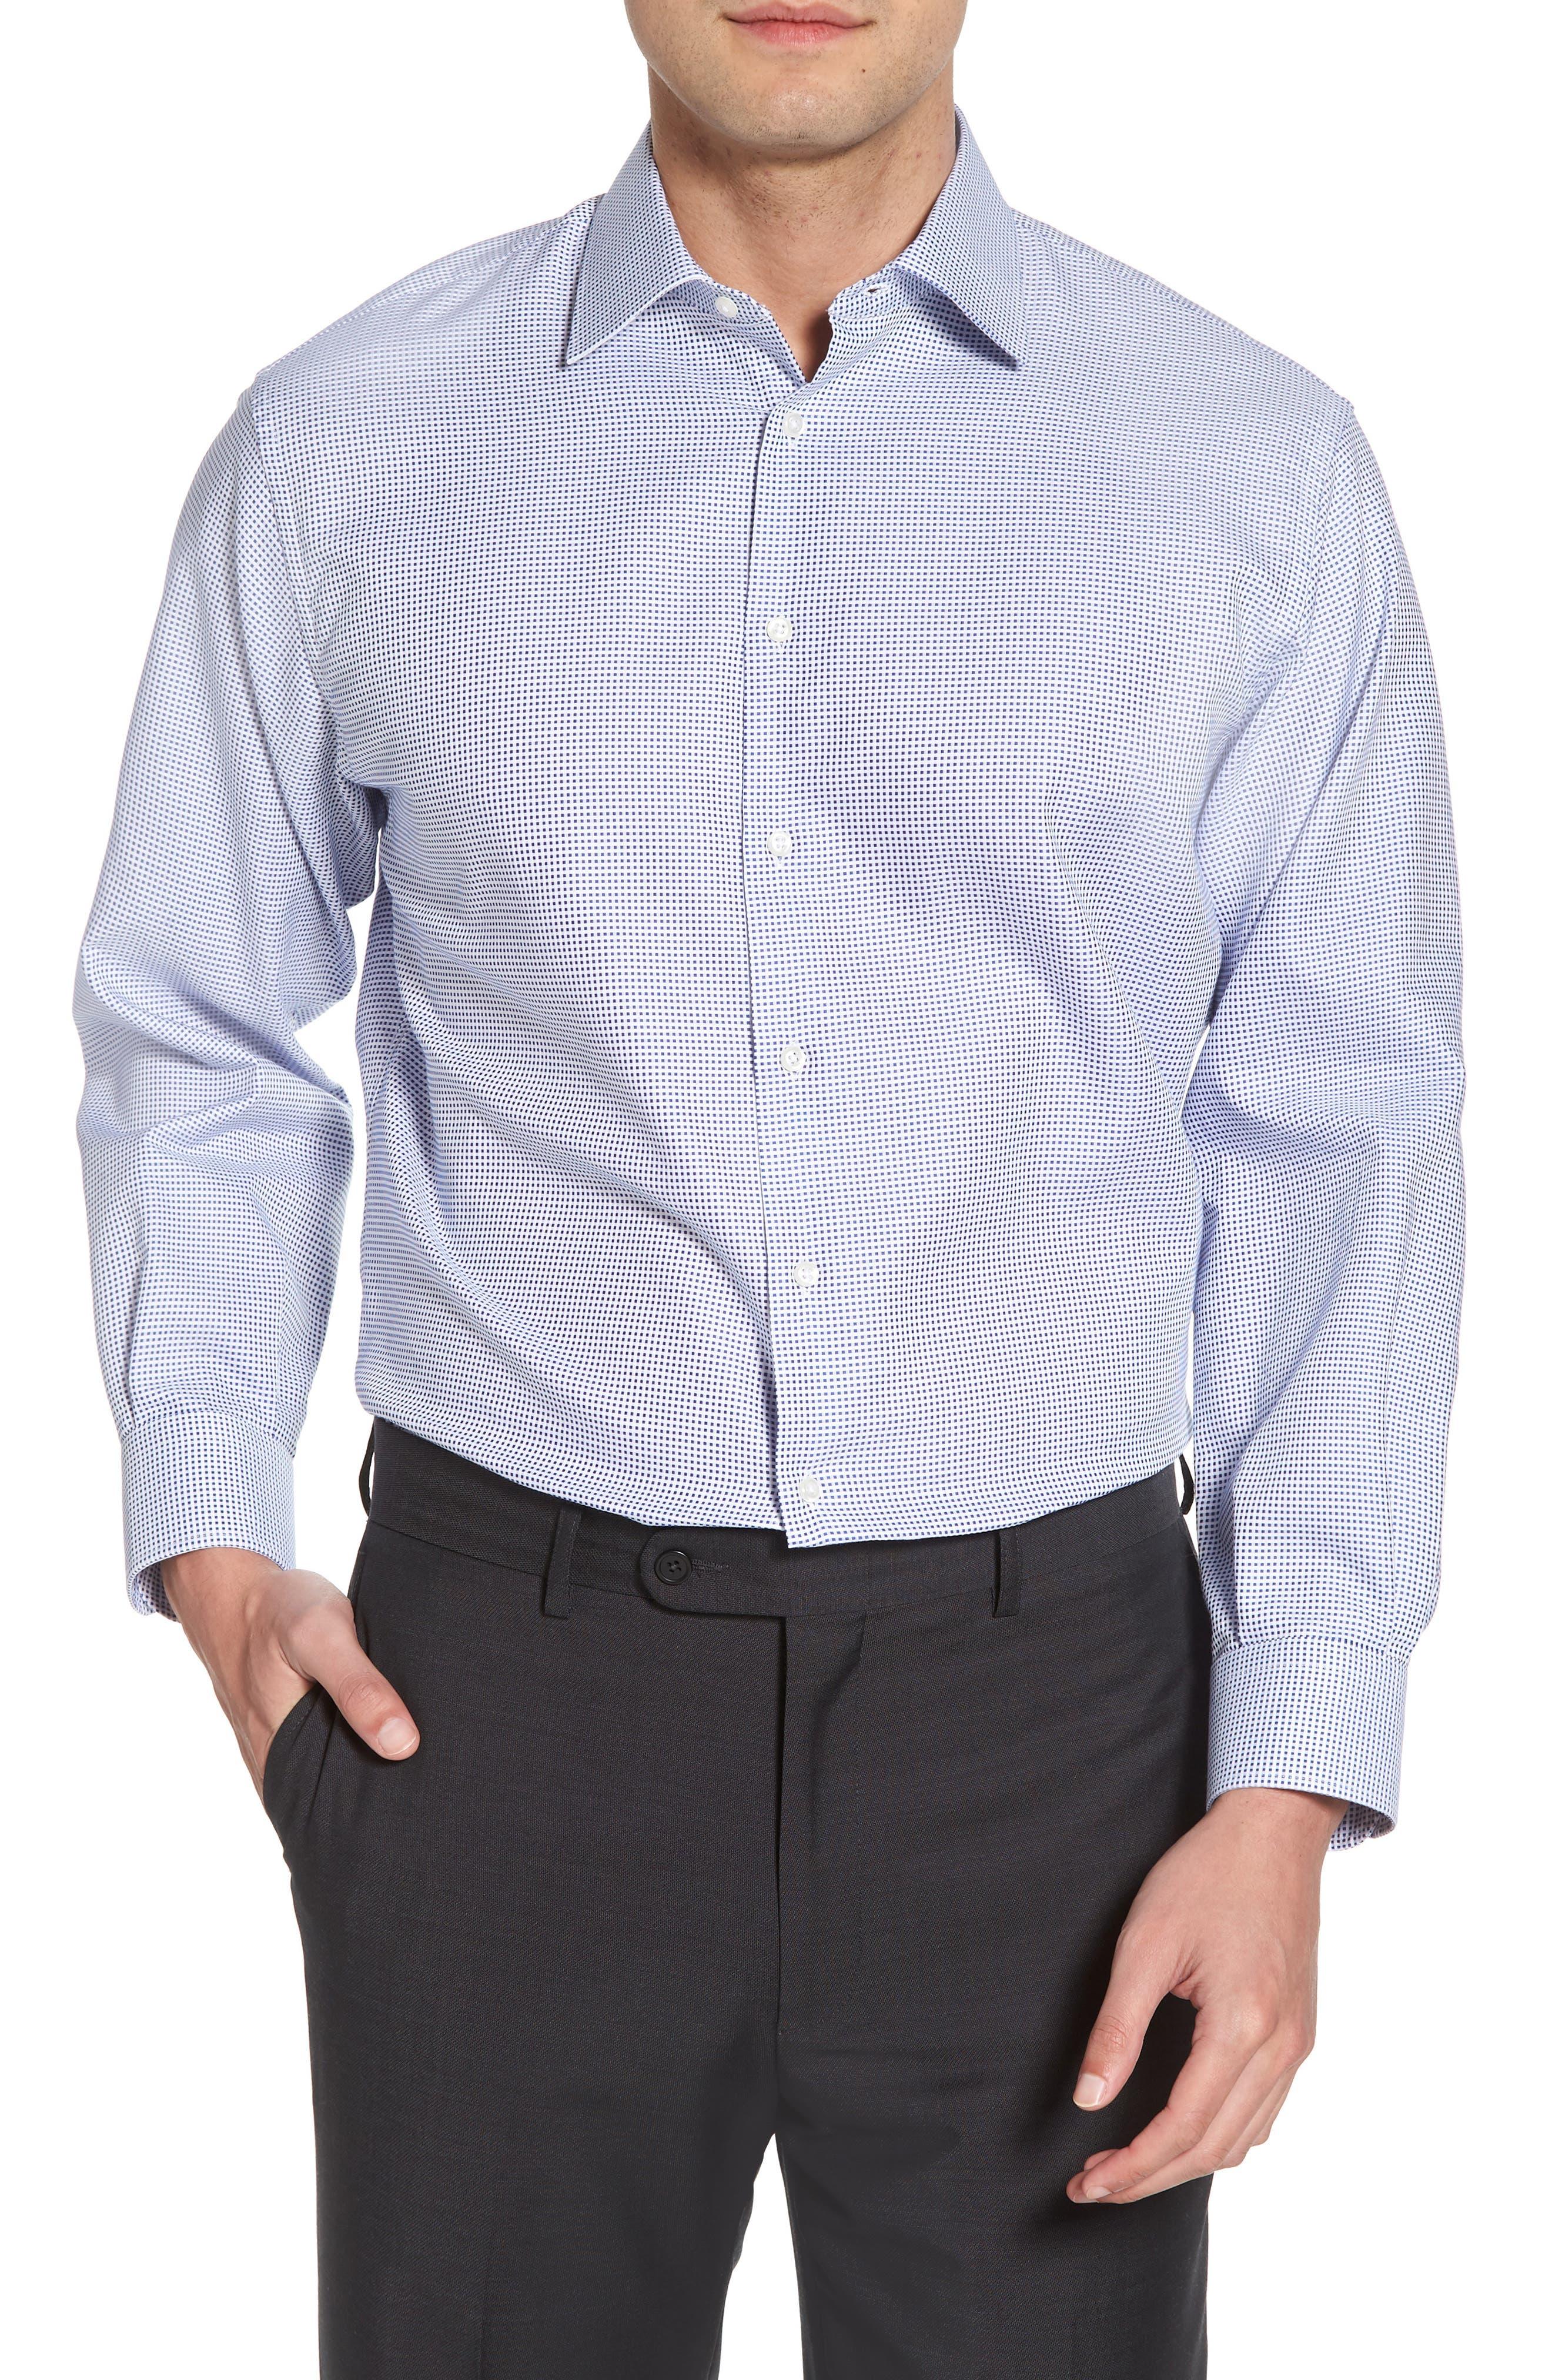 Alternate Image 1 Selected - Nordstrom Men's Shop Classic Fit Microcheck Dress Shirt